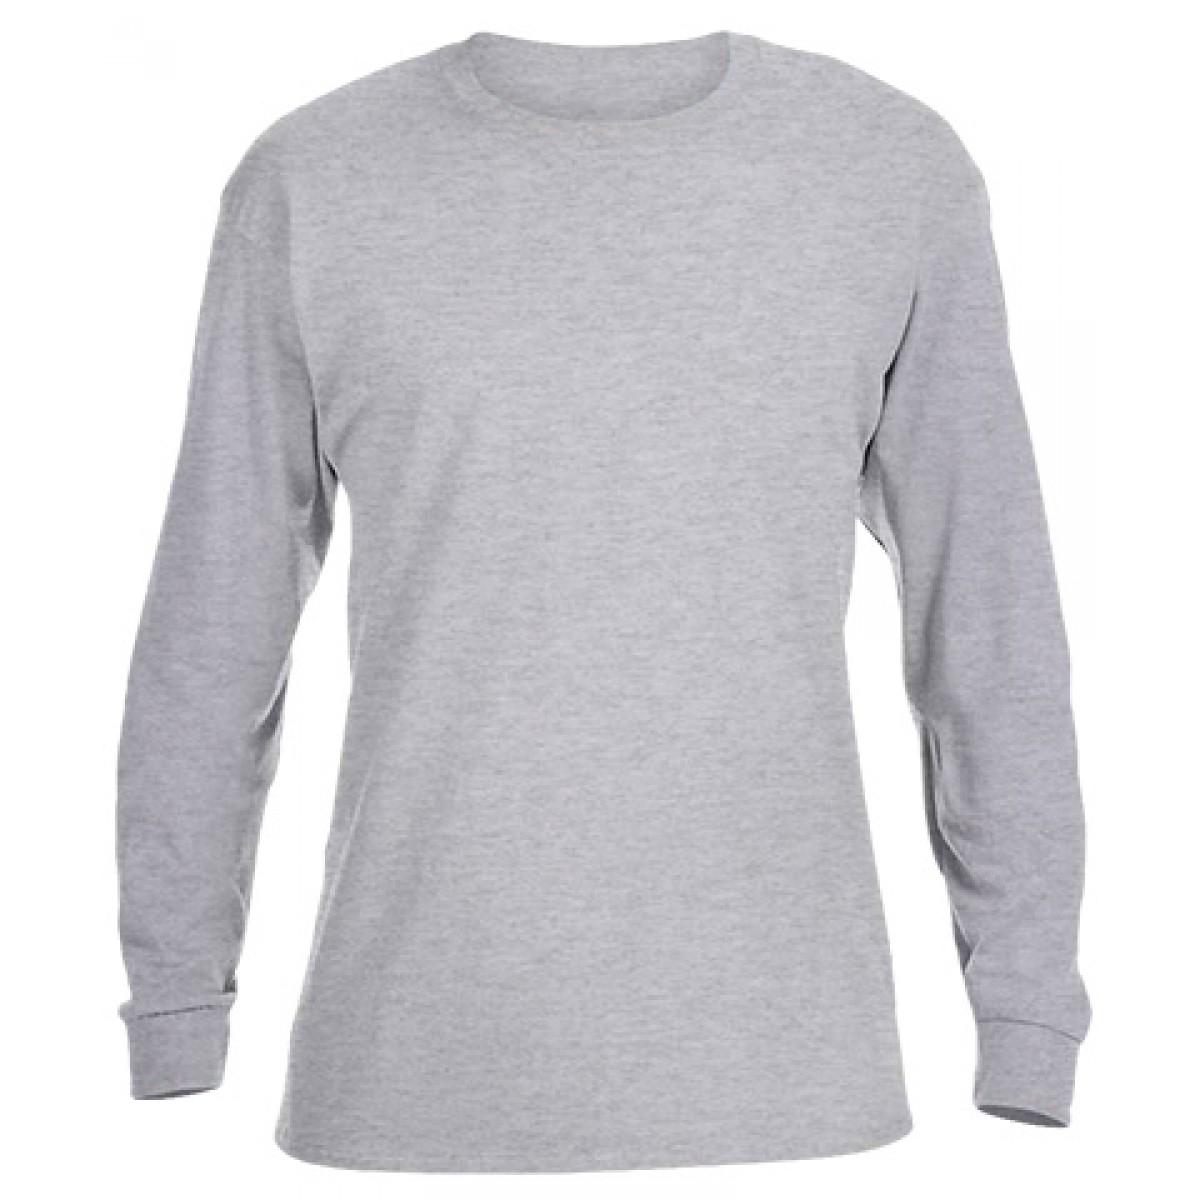 Ultra Cotton Long-Sleeve T-Shirt-Ash Gray-2XL